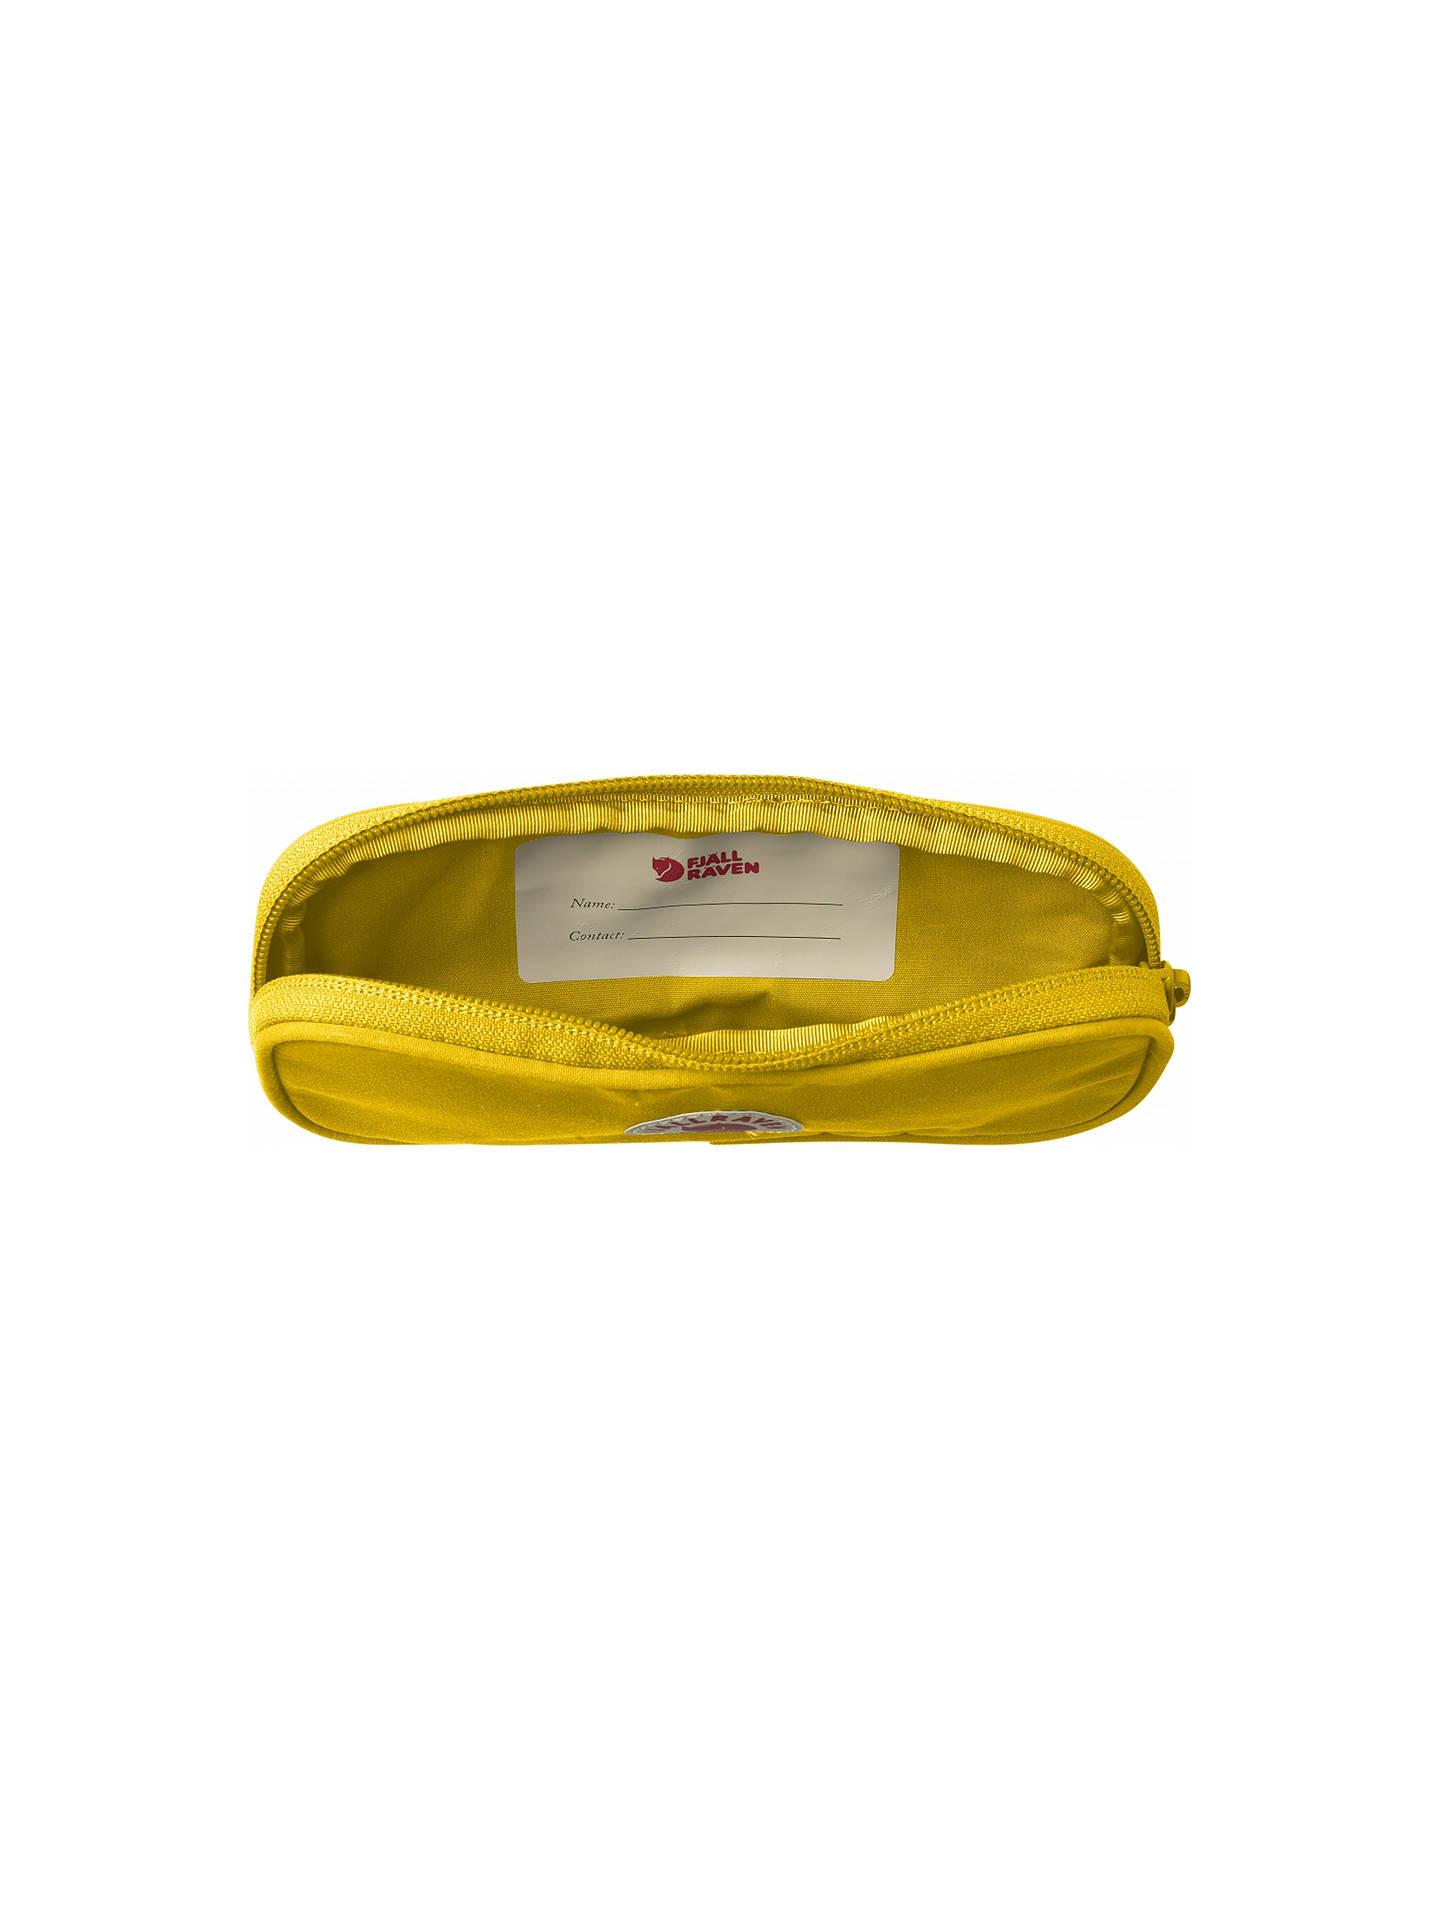 Fjallraven Kanken Pen Case Warm Yellow